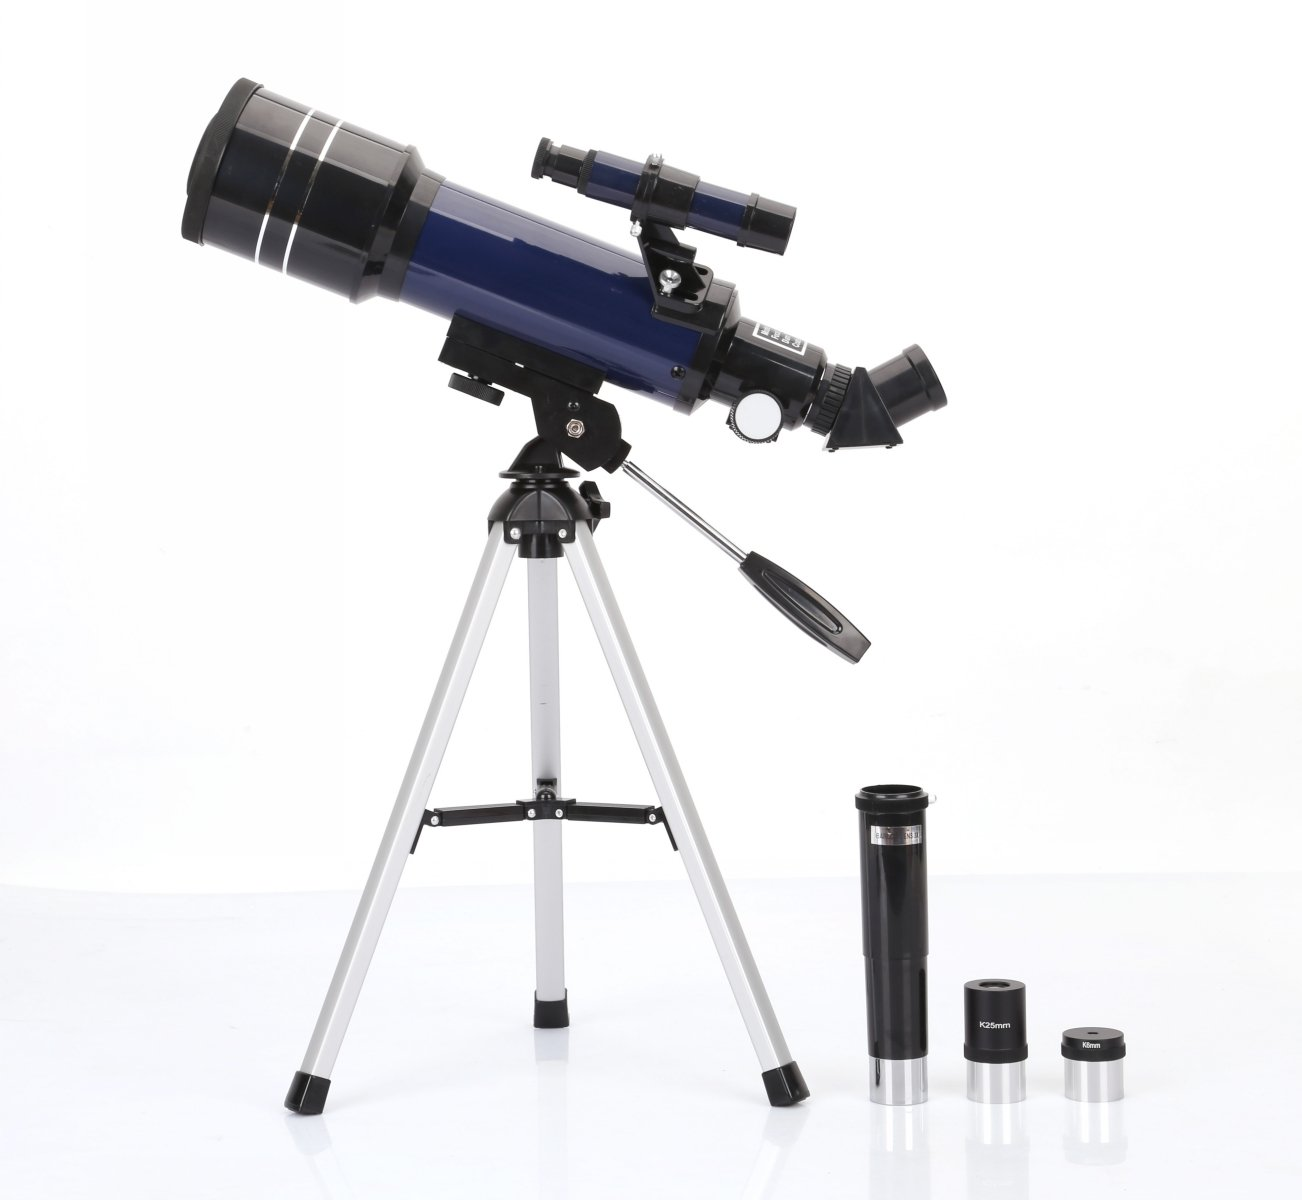 Amazon.com : GEERTOP AZ Ultra Clear Astronomical Refractor Tabletop  Telescope With Tripod U0026 Finder Scope, 400X70mm, For Beginner Sky Gazers U0026  Teens : Camera ...